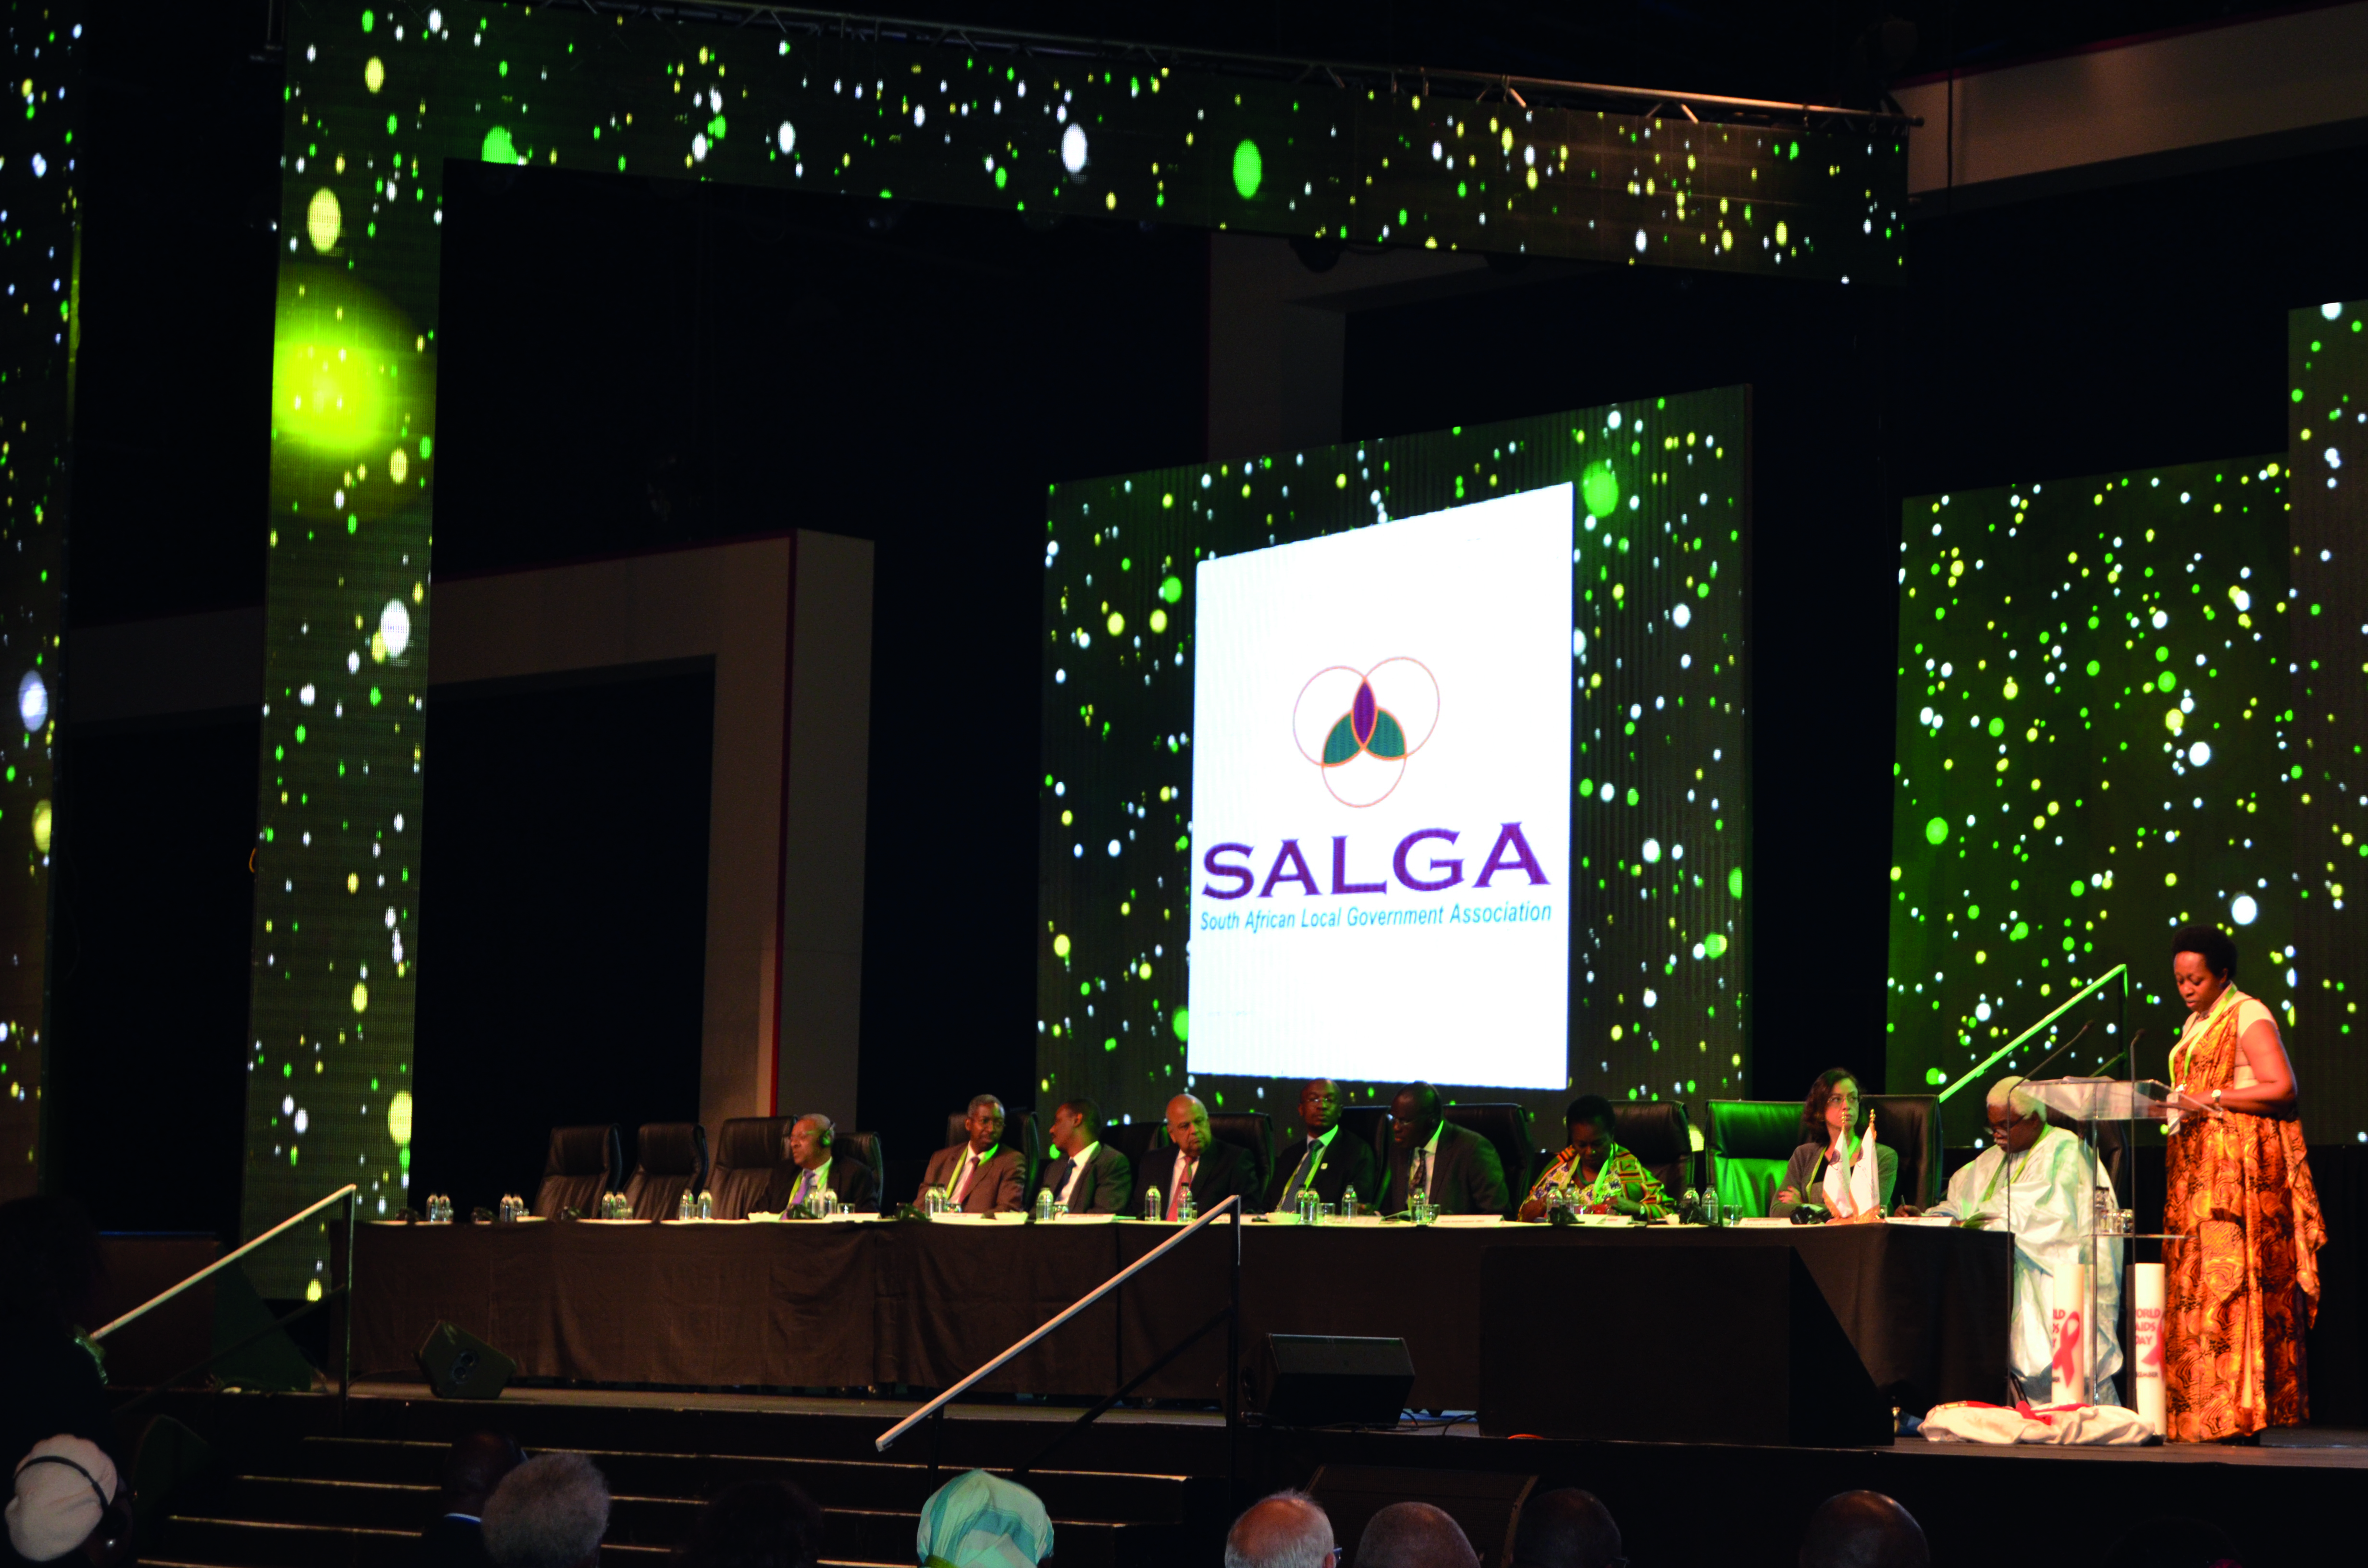 Delegates at the SALGA Awards Celebrating 15 Years of Restoring Human Dignity event.